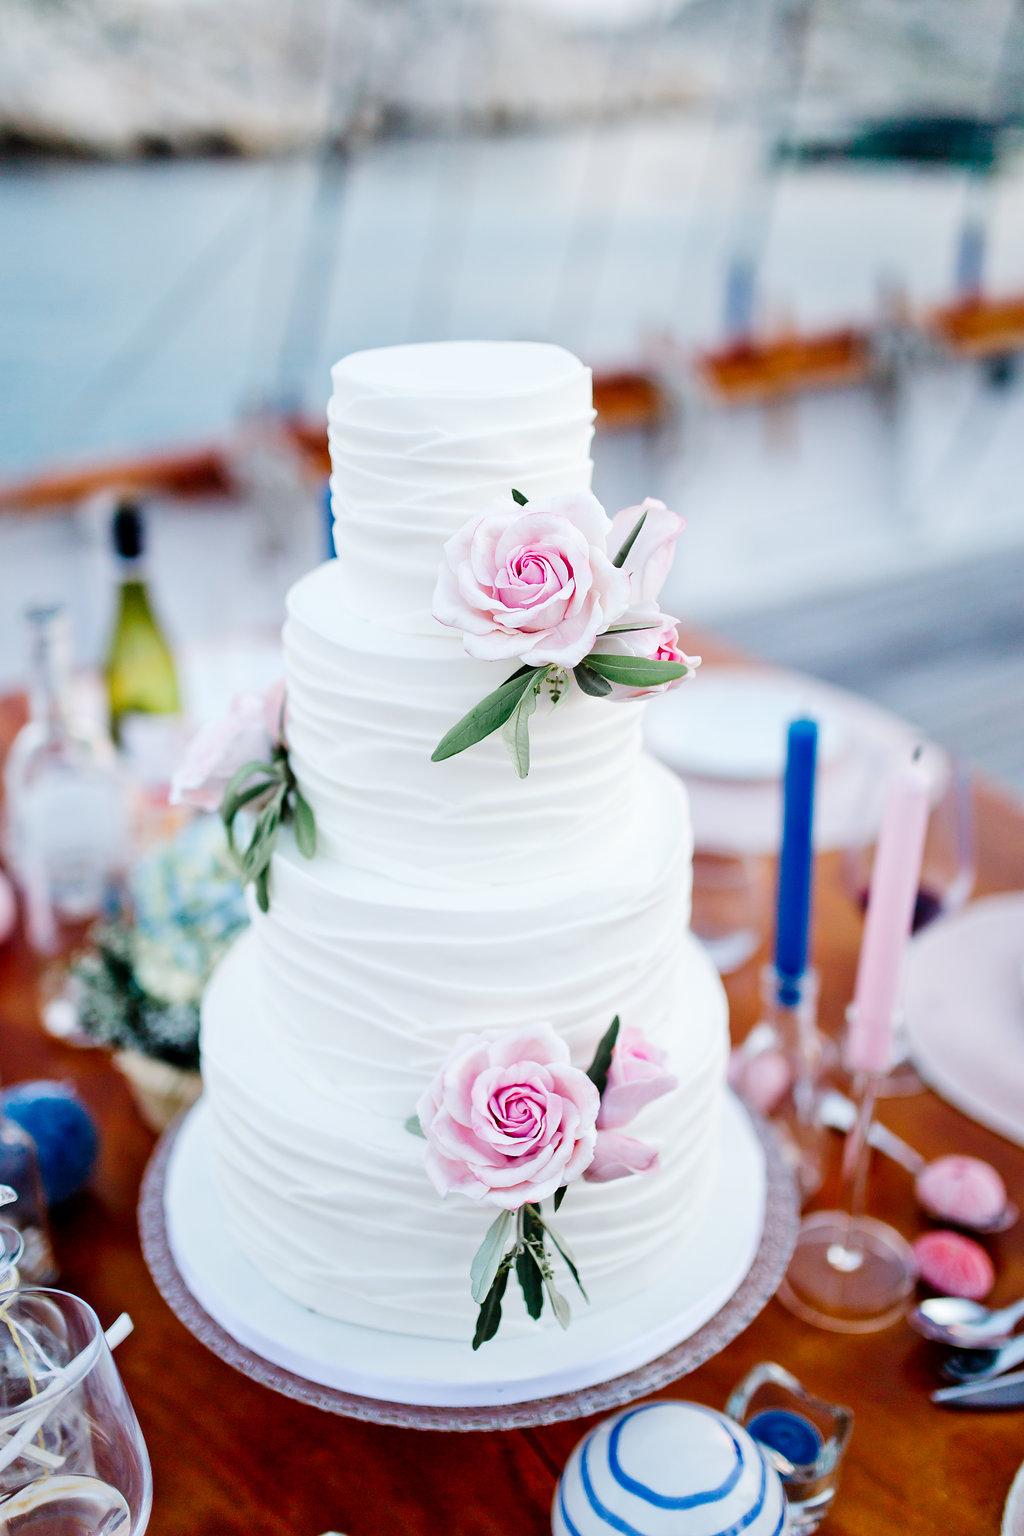 le coeur dans les etoiles - wedding planner - provence - sardaigne - shooting inspiration - mariage voilier - audrey carnoy - wedding cake